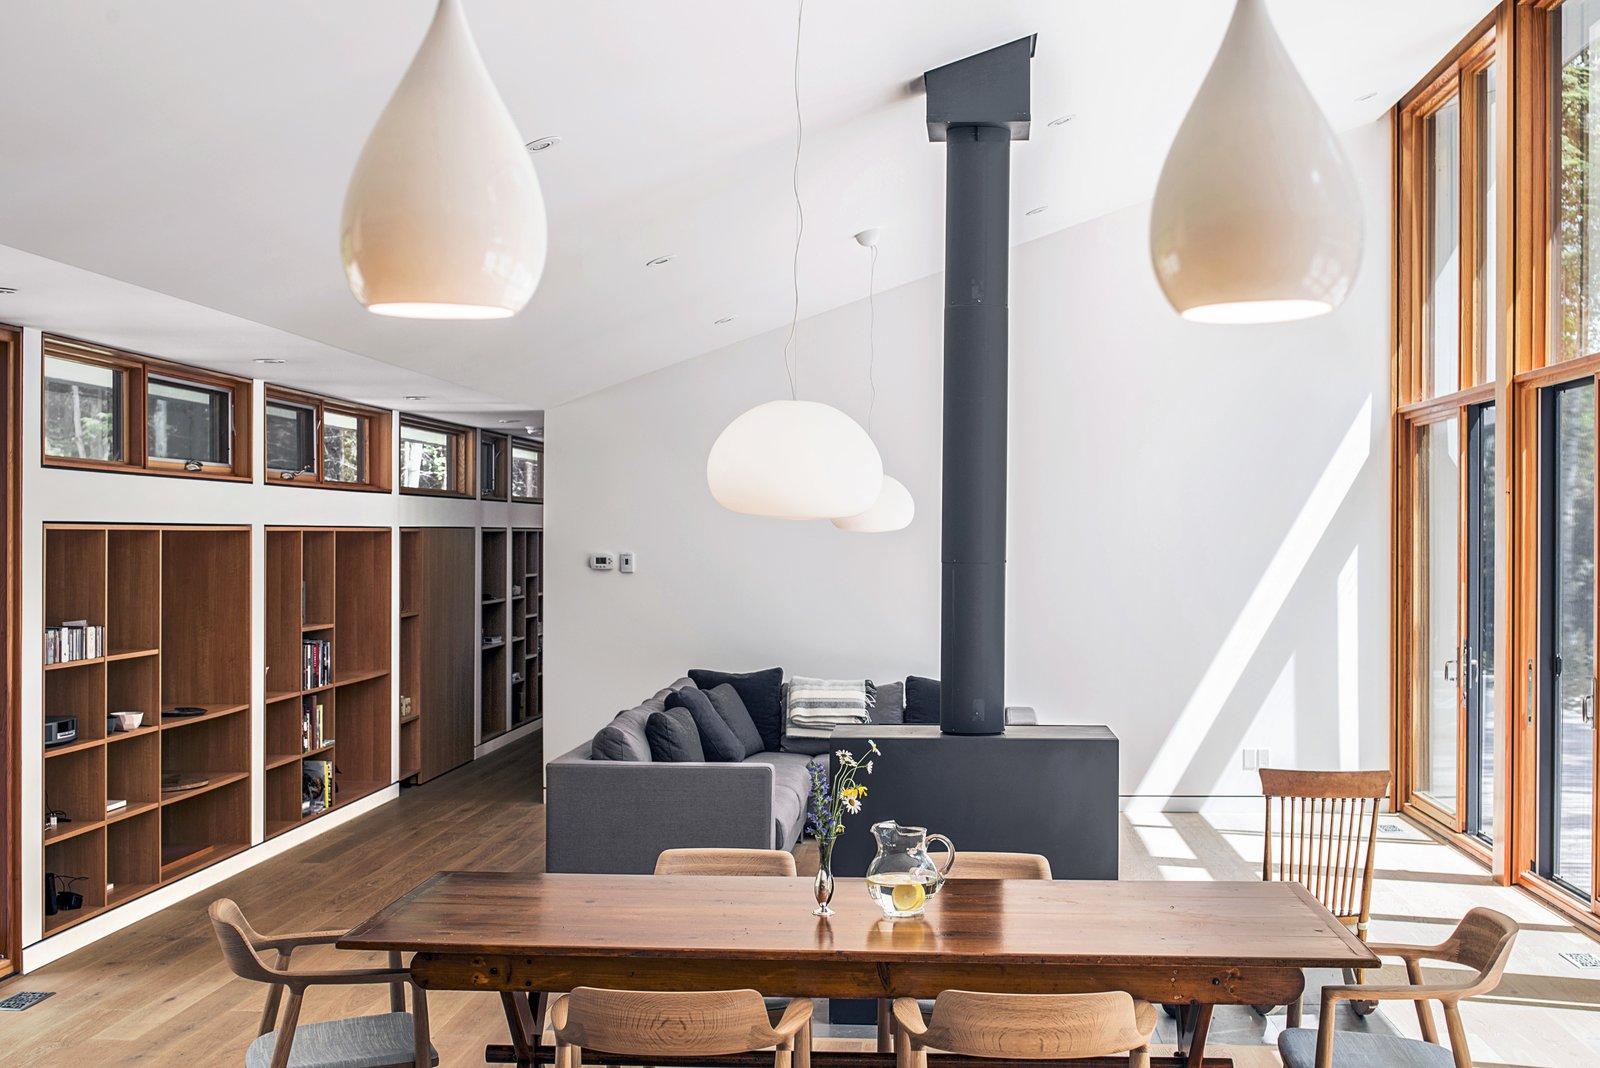 Dining Room Recessed Lighting Table Pendant Shelves Medium Hardwood Floor